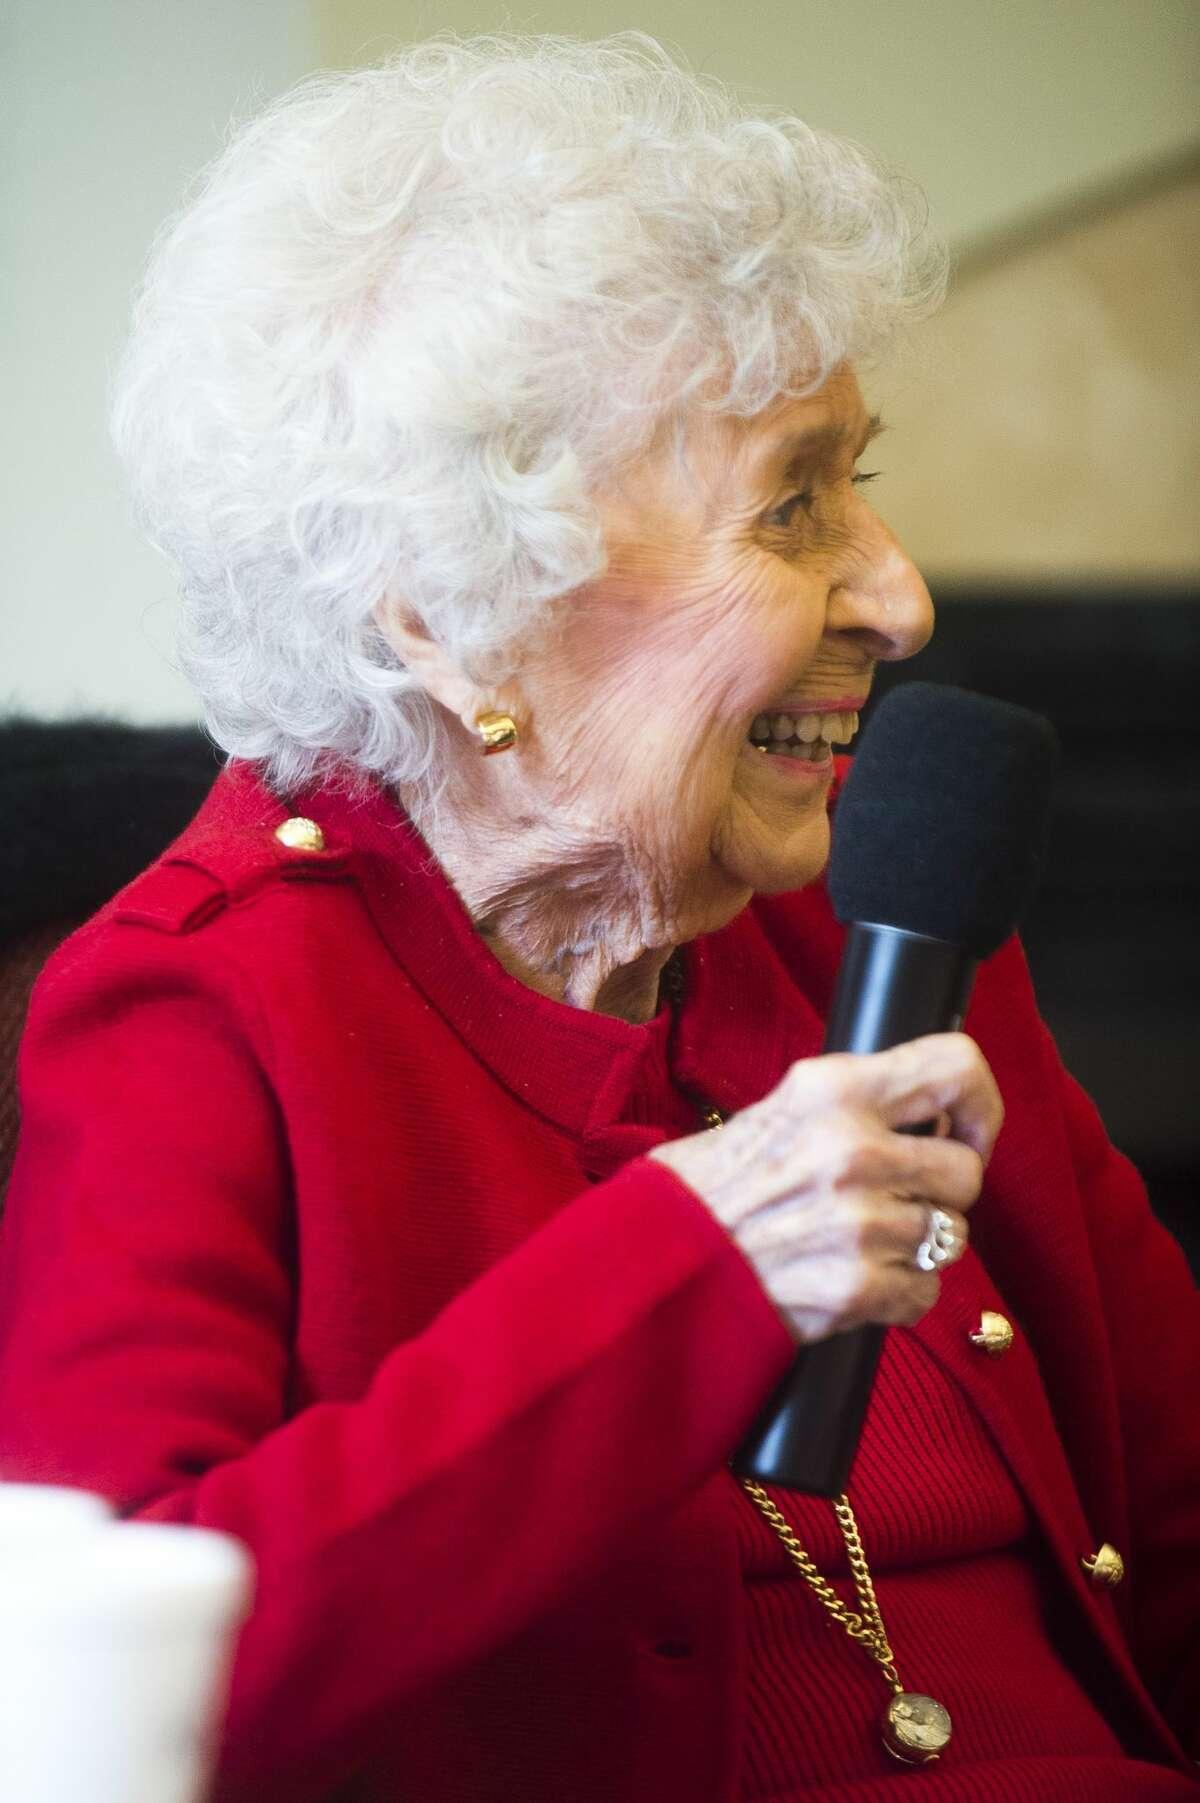 Rhea Currie, 101, speaks during a conversation between a panel of four Midland centenarians on Thursday, Nov. 9, 2017 at the Herbert D. Doan Midland County History Center. (Katy Kildee/kkildee@mdn.net)